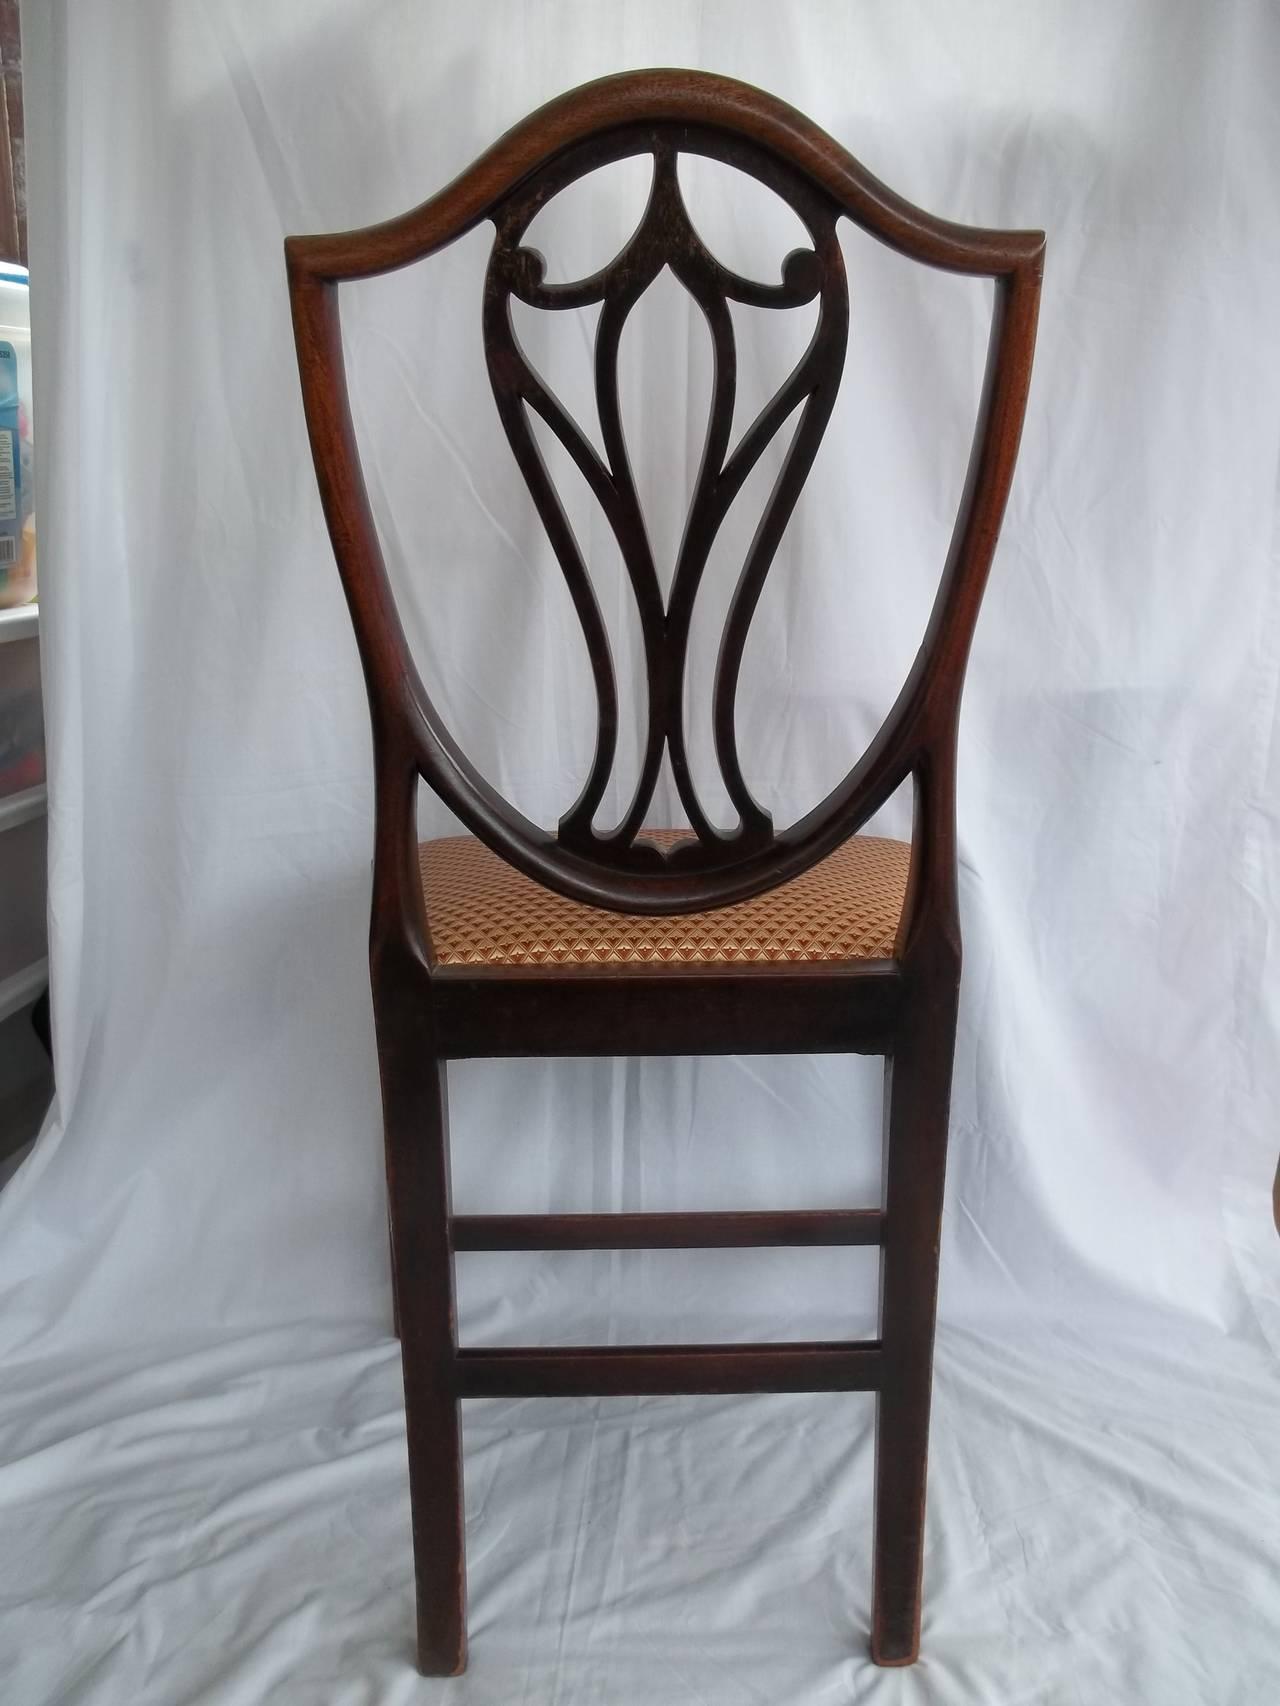 Elegant 18th Century Hepplewhite Side Chair in Mahogany, English circa 1785 For Sale 4